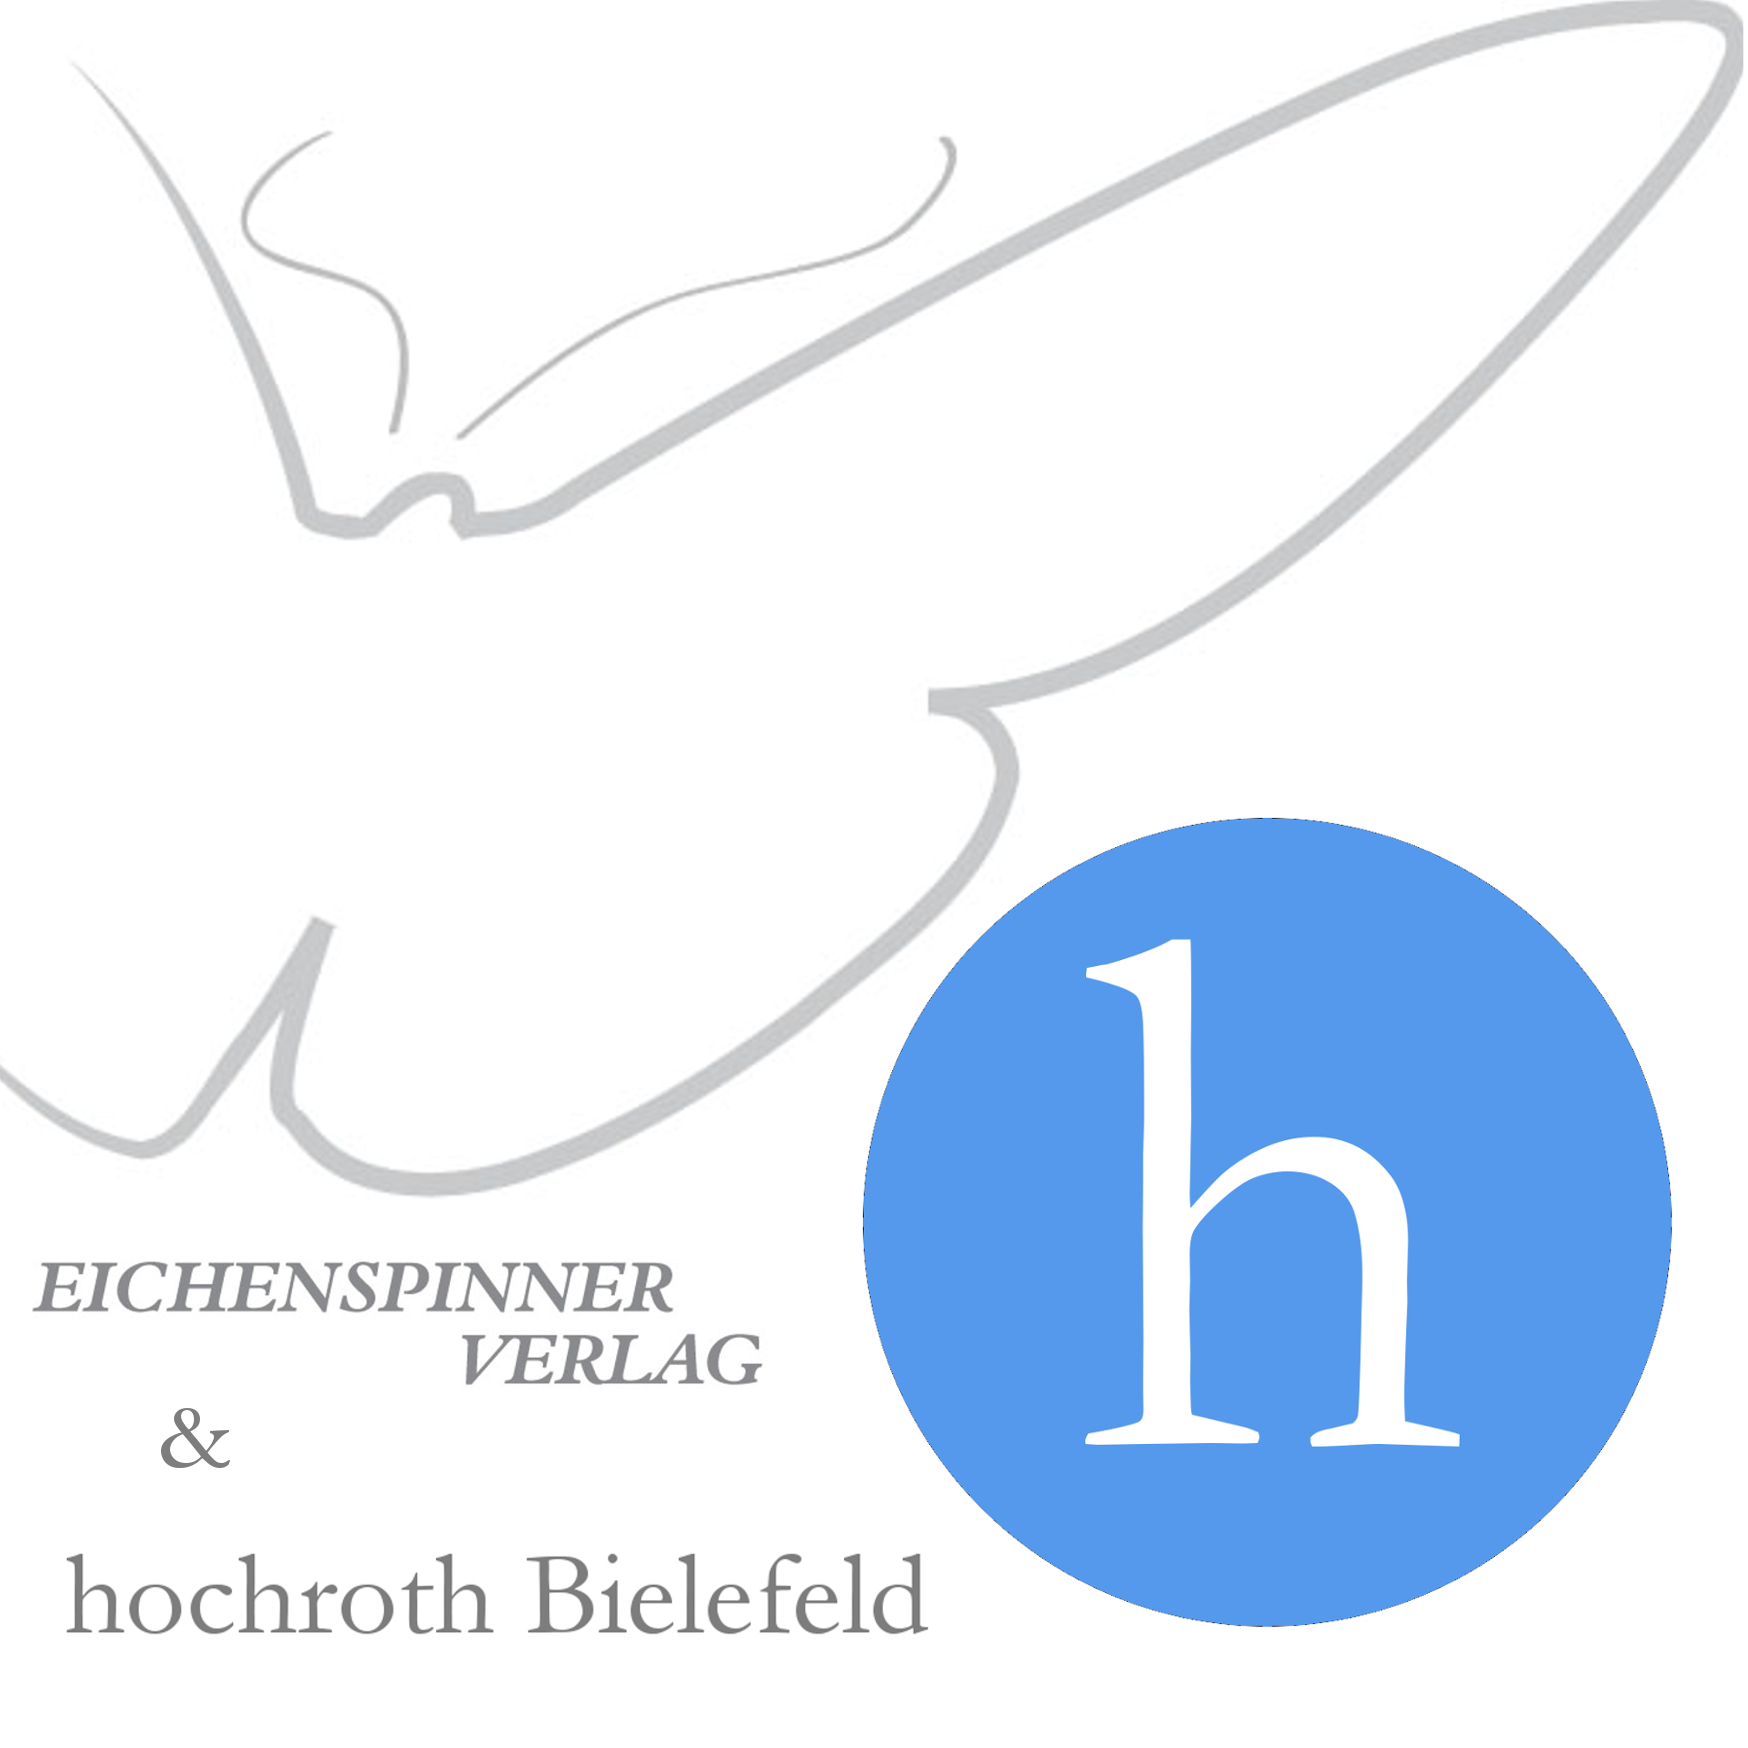 LV_NRW_Logo_hochroth&Eichenspinner